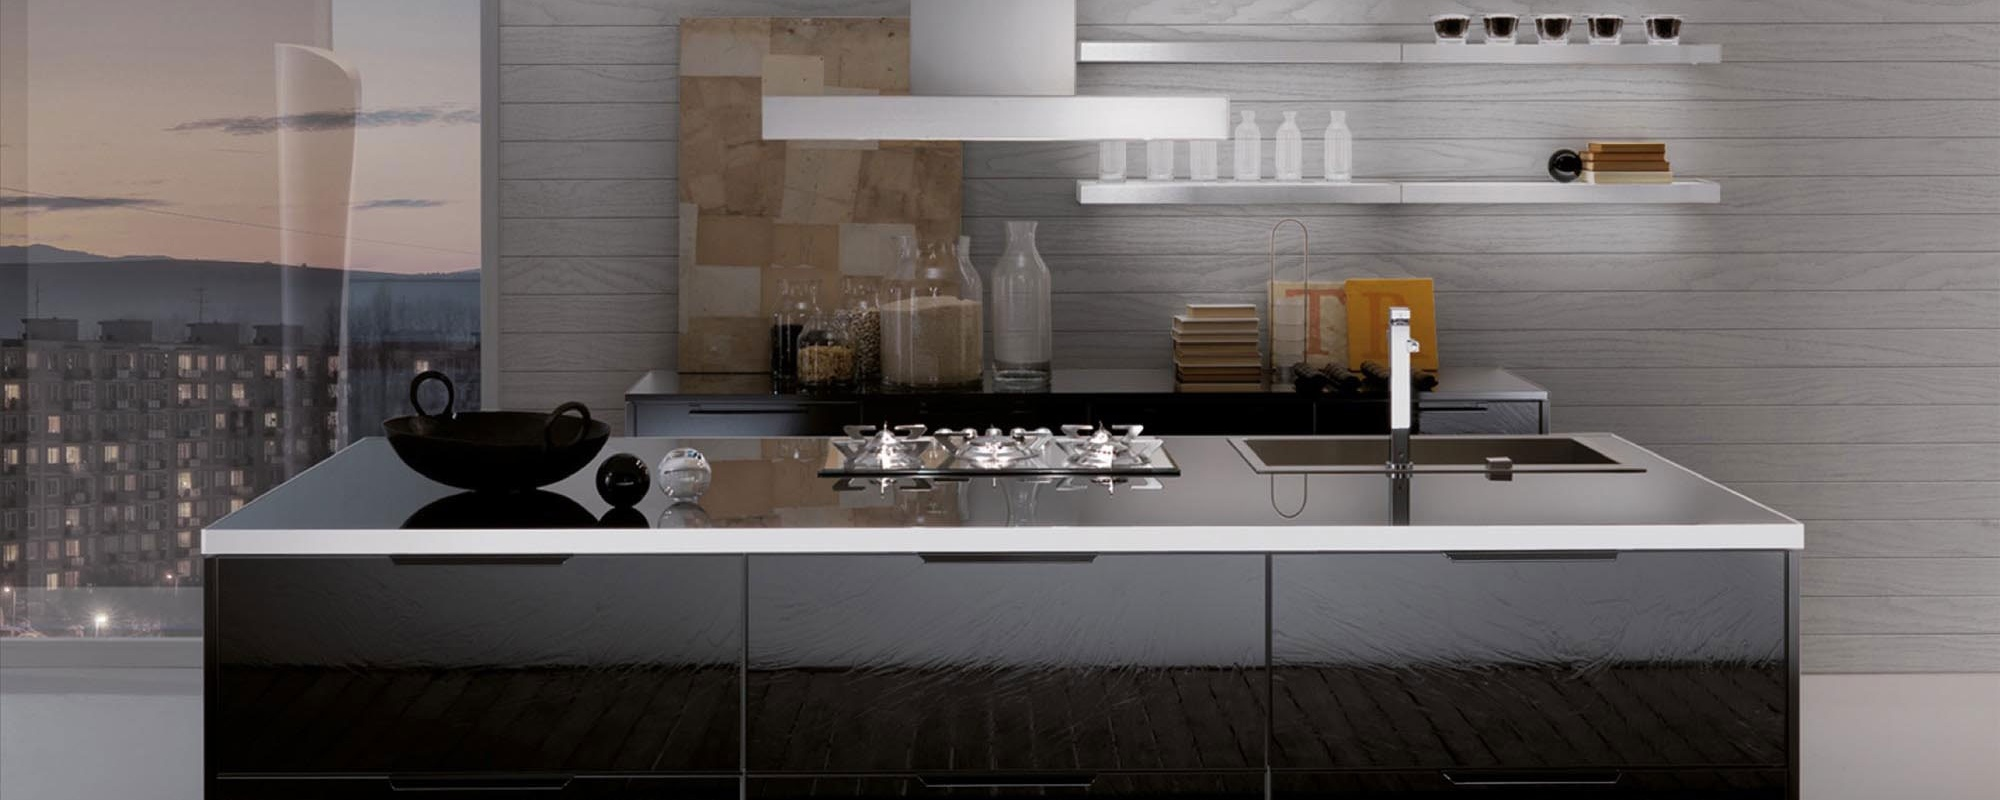 Stunning Cucine Berloni Immagini Photos - Ideas & Design 2017 ...